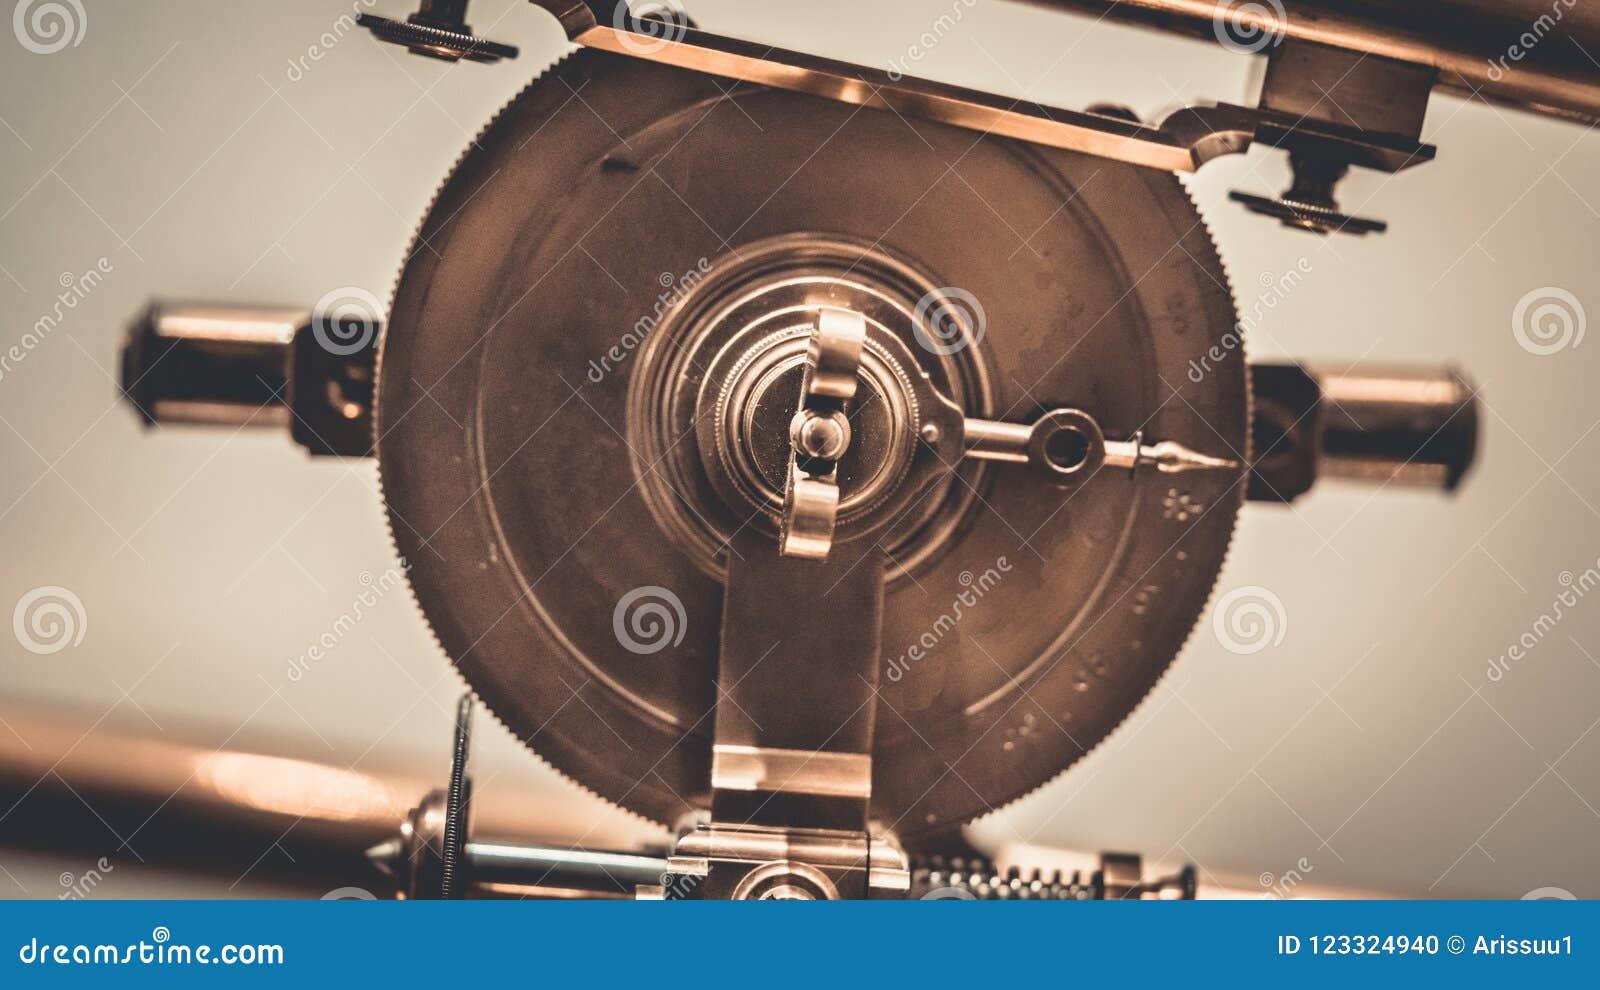 Industrial Steel Serrated Cutting Blade